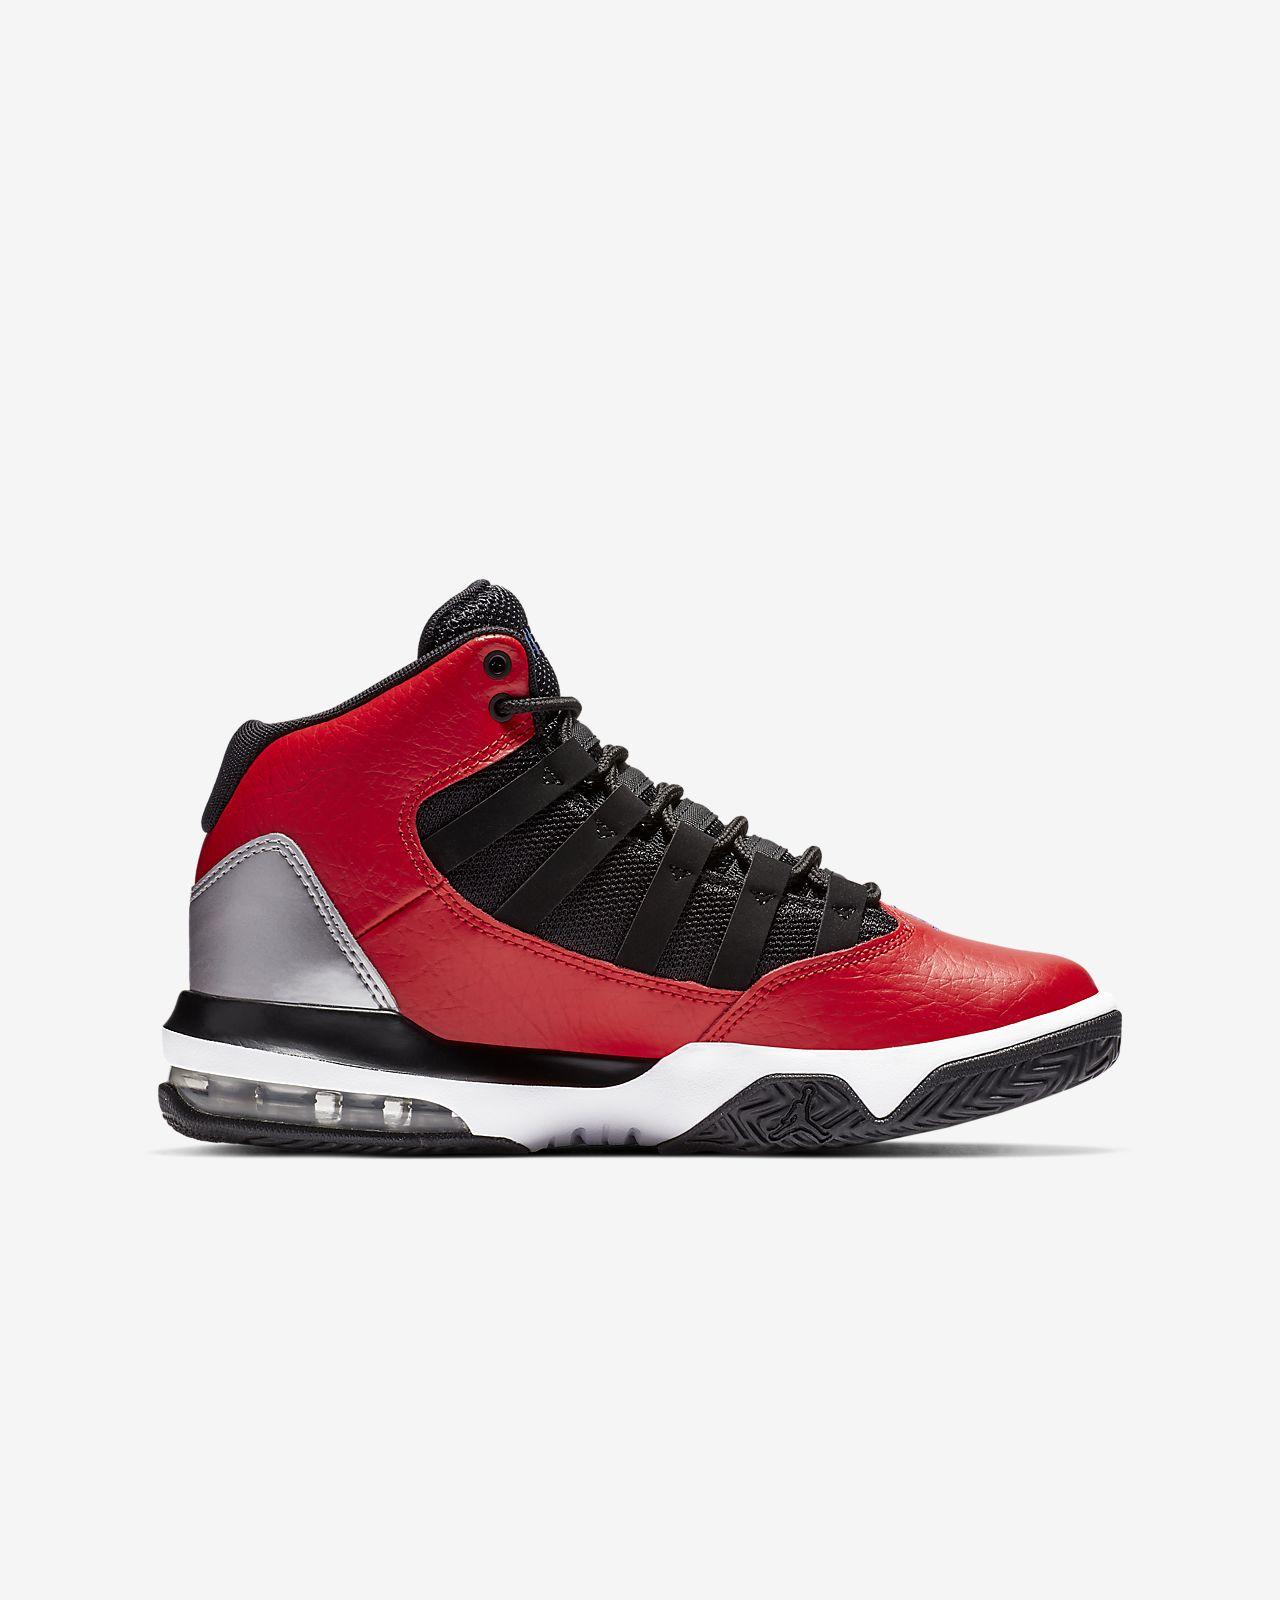 premium selection 473a6 d83b9 ... Calzado para niños talla grande Jordan Max Aura